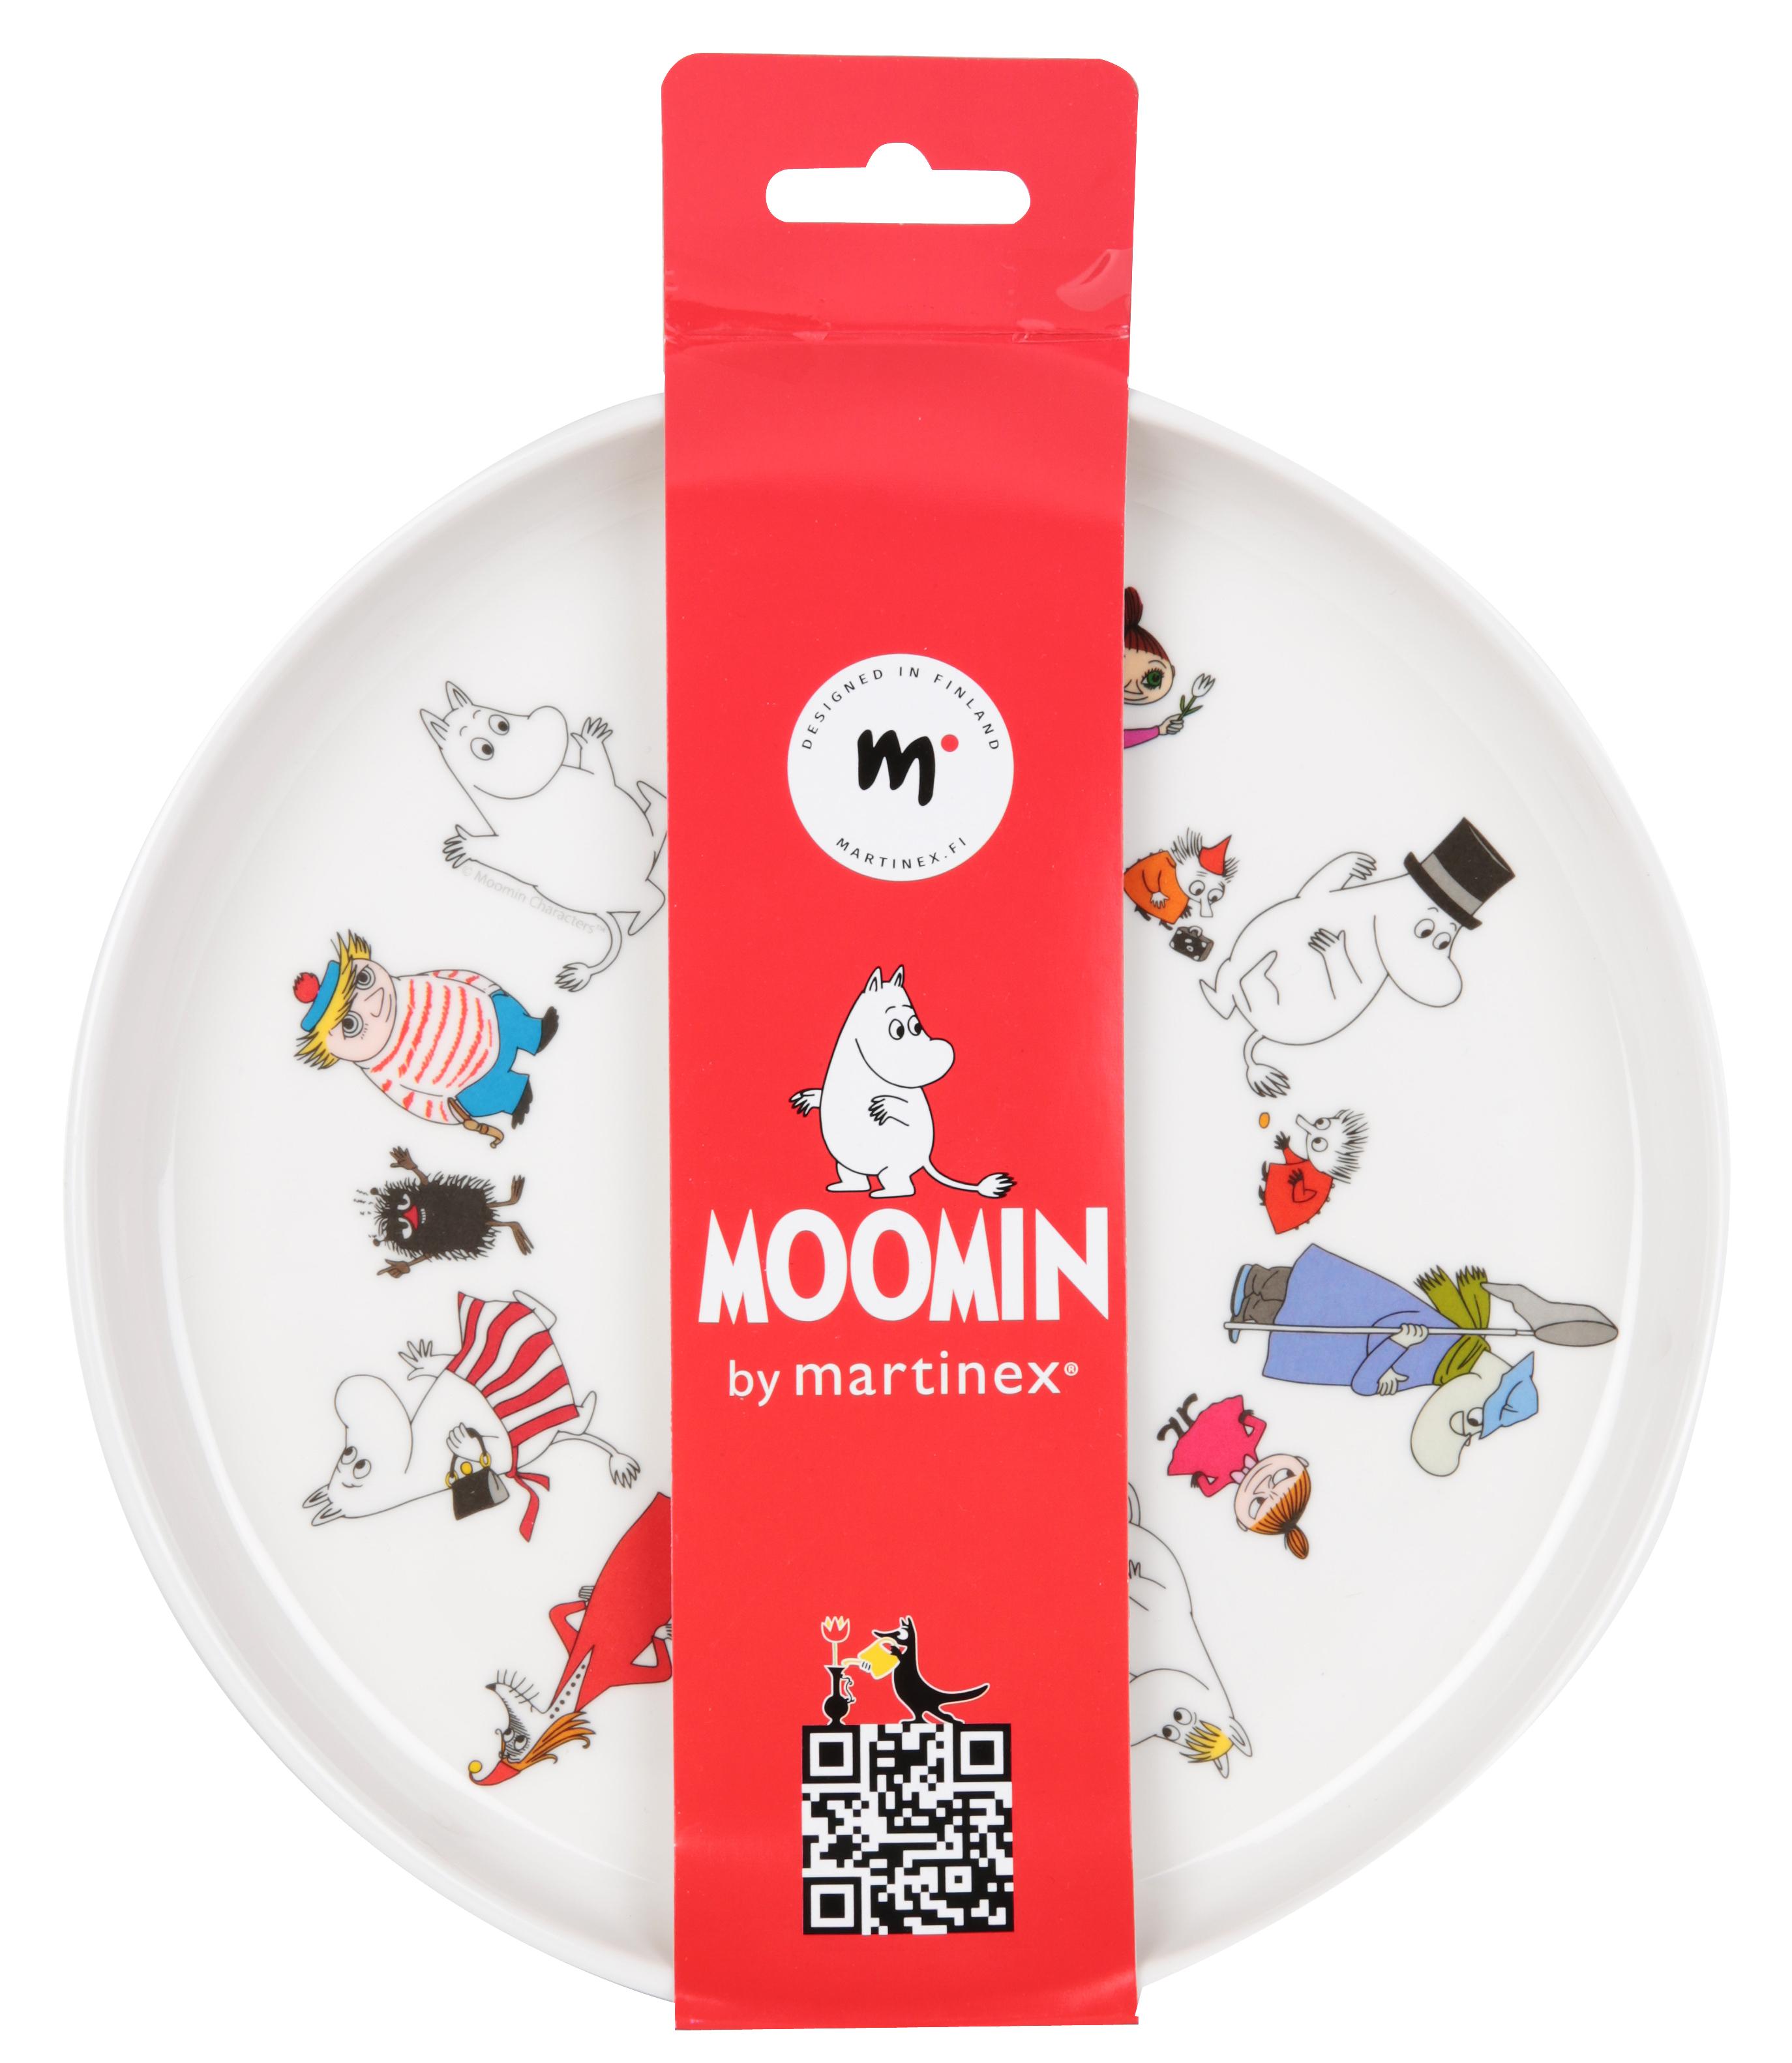 Martinex Moomin Plate